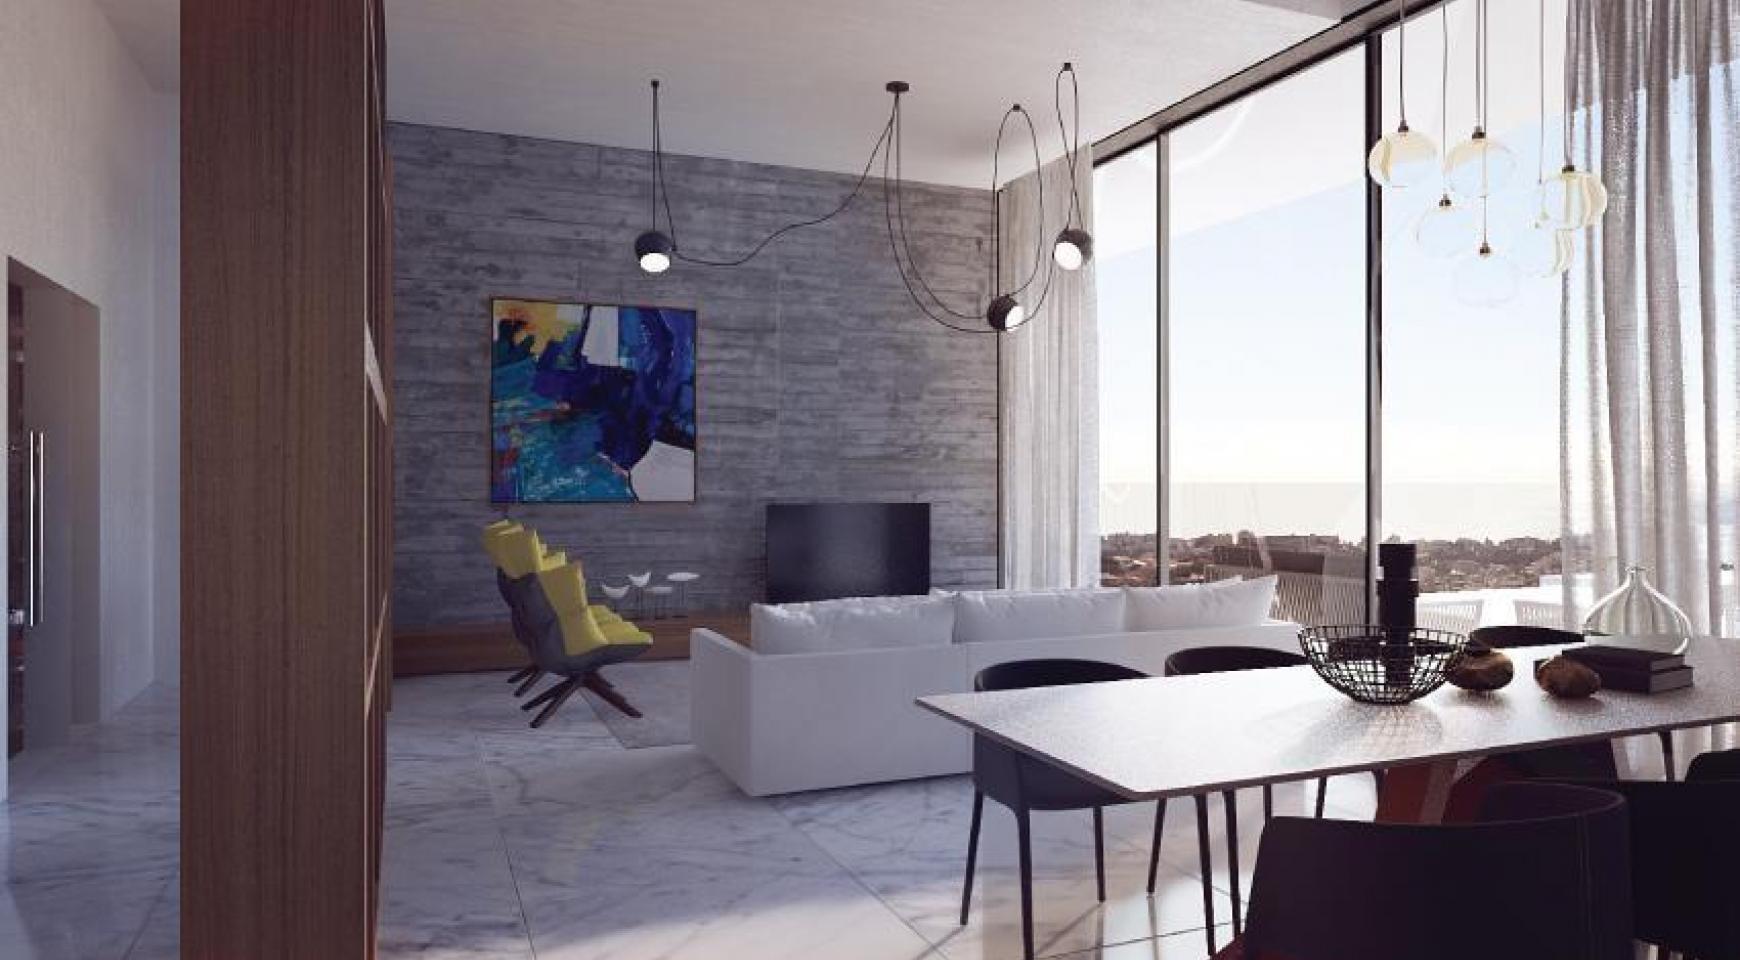 Exclusive 4 Bedroom Villa with Stunning Views in Germasogeia - 6